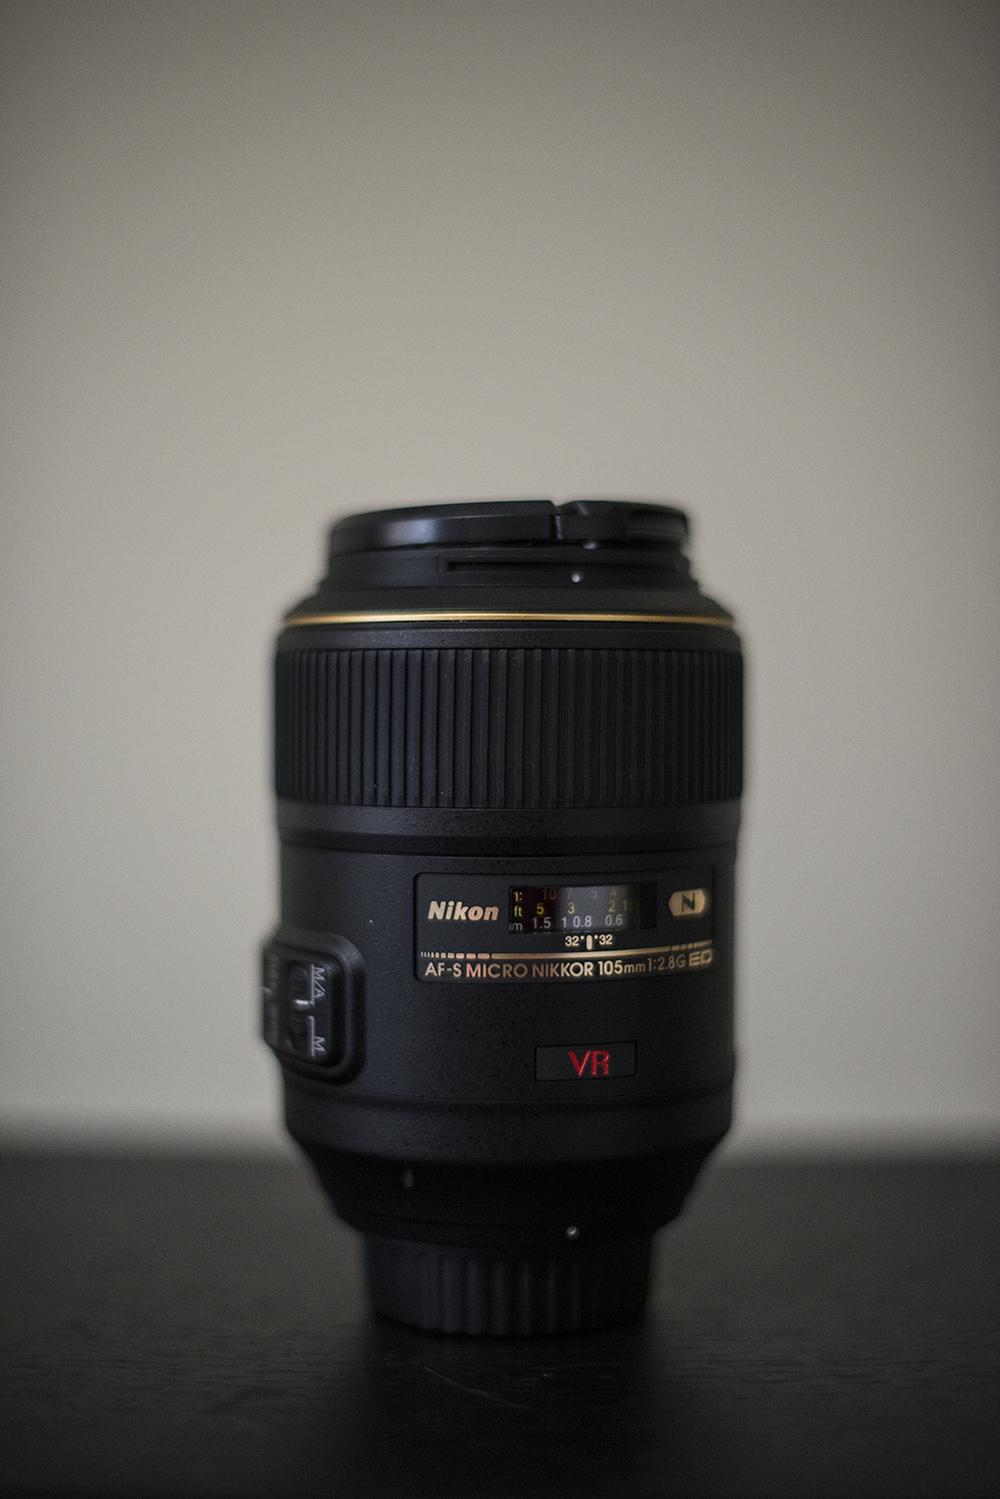 Nikon 105mm f/2.8 Macro Lens